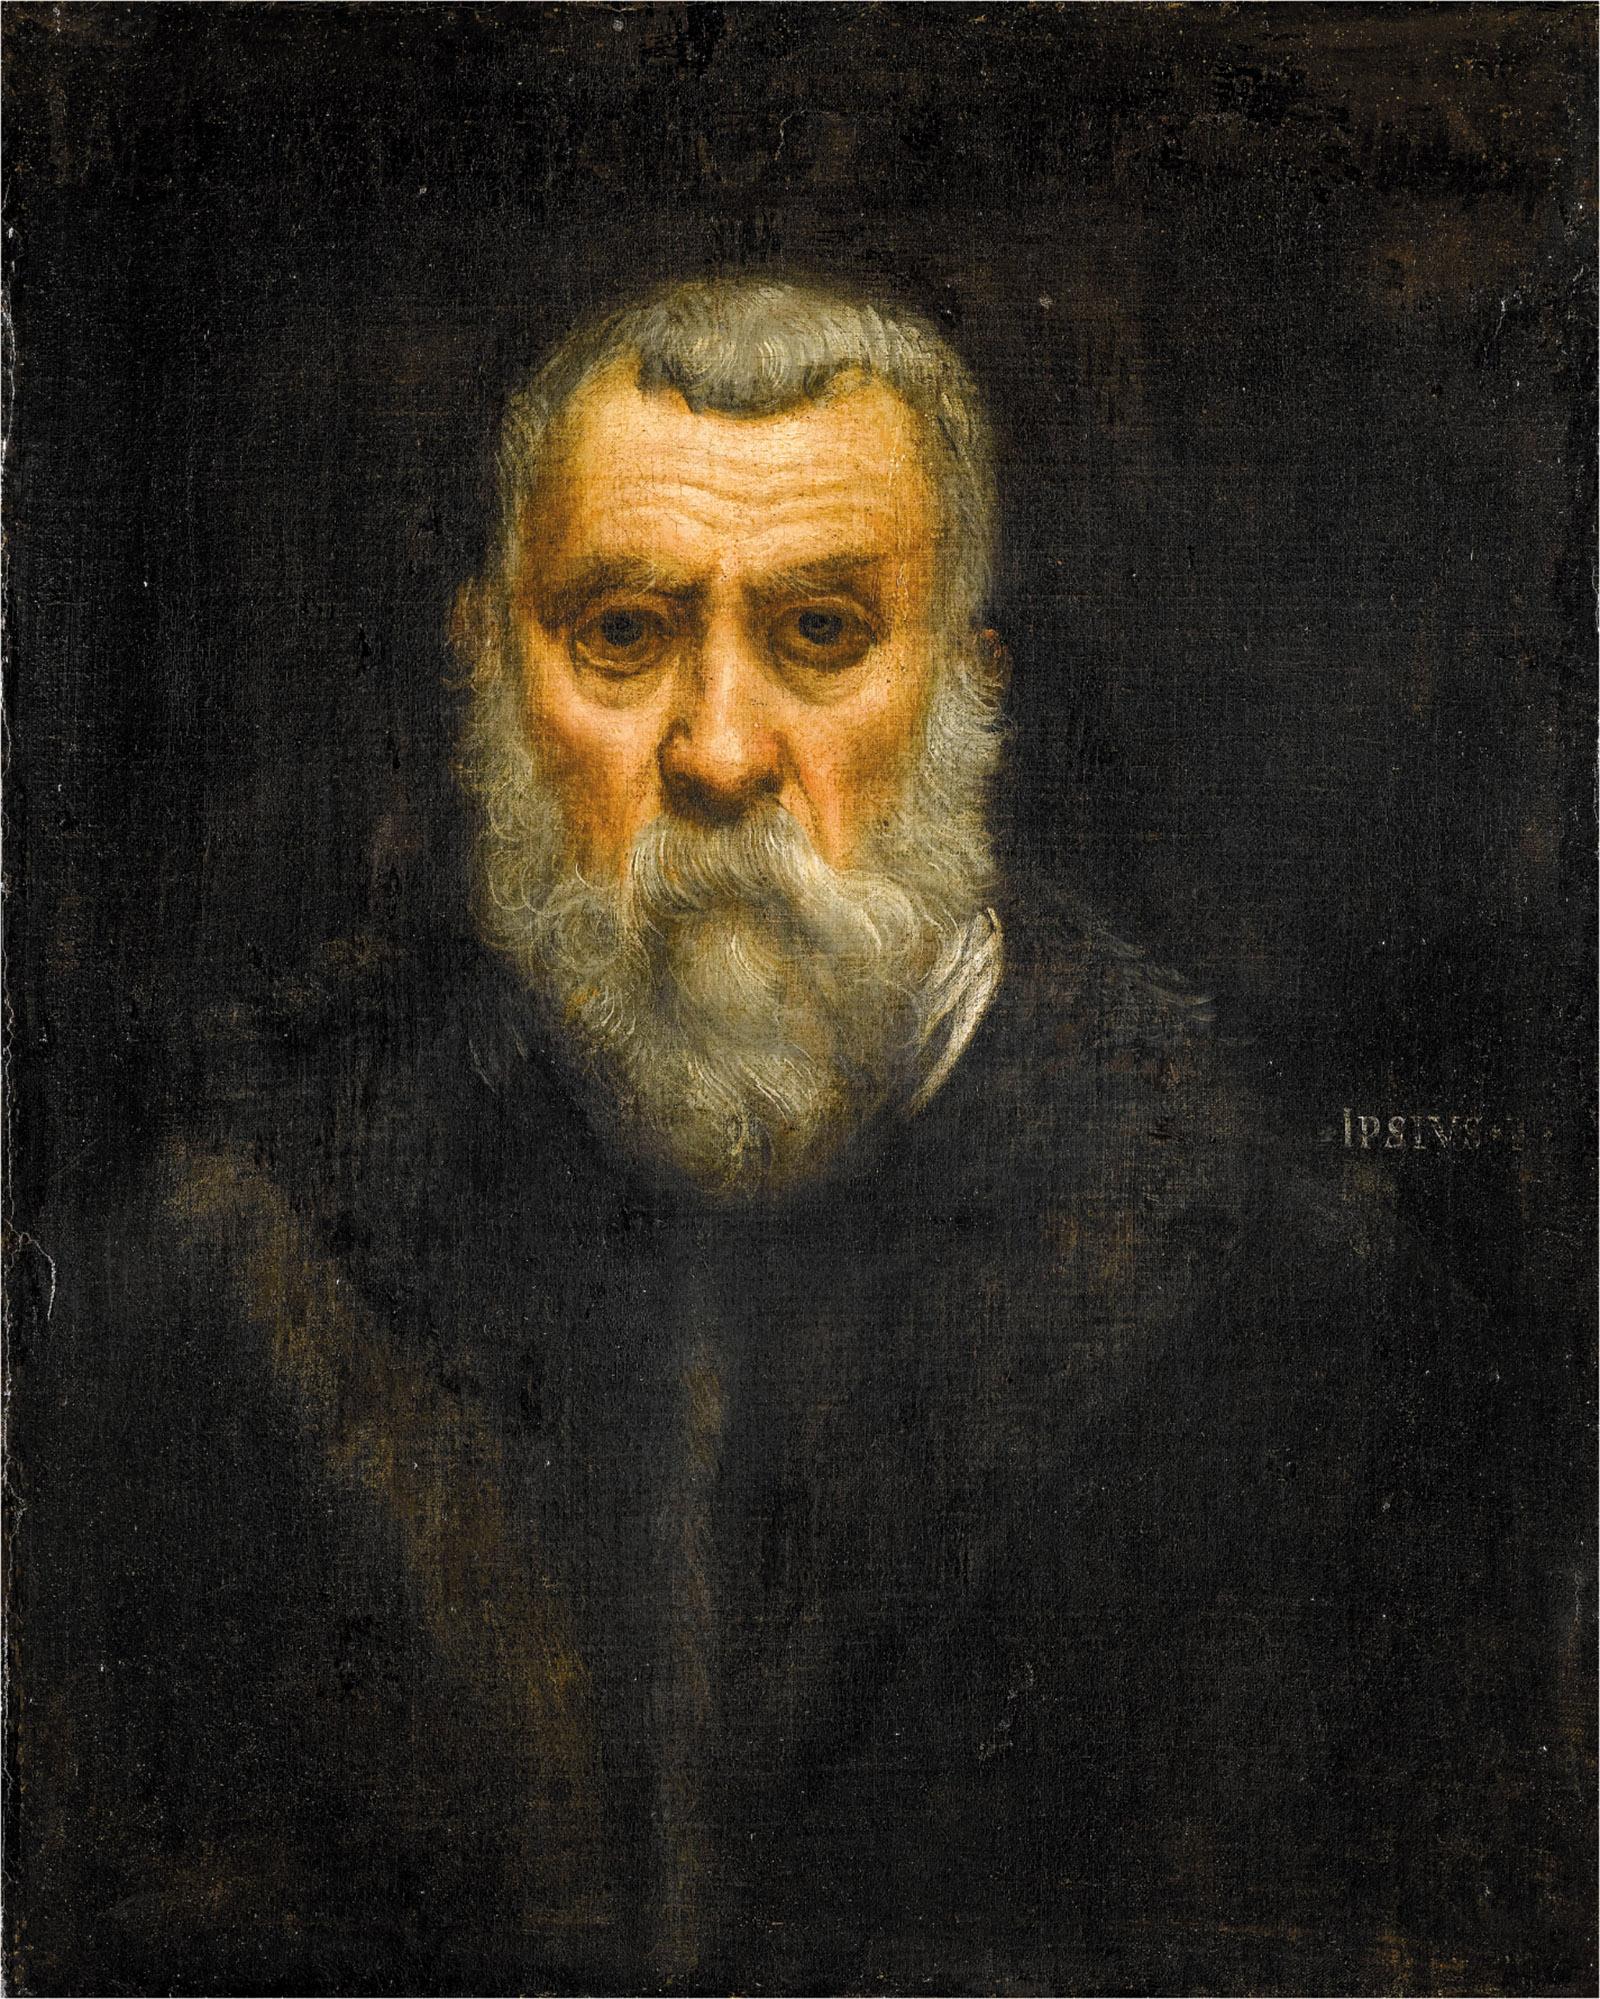 Self-Portrait by Jacopo Tintoretto